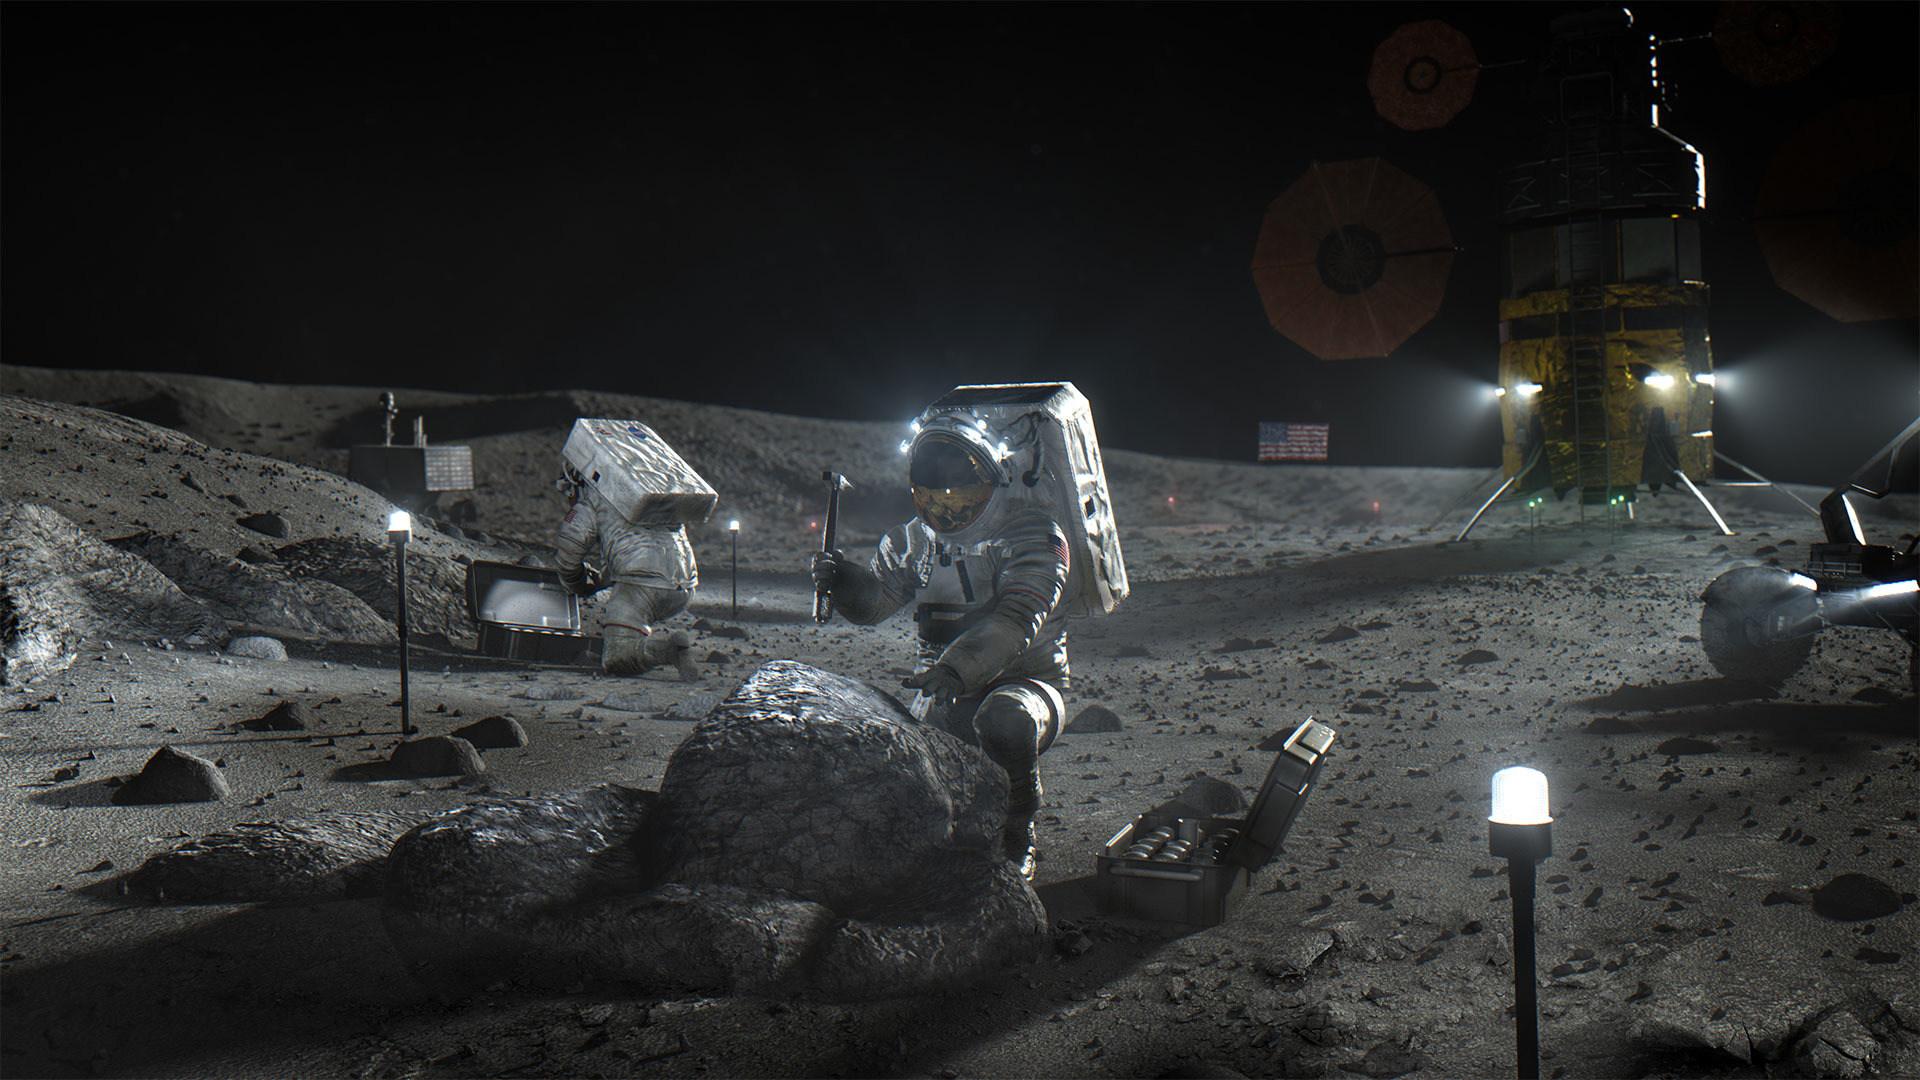 Nasa, Mond, Mondlandung, Astronaut, Artemis